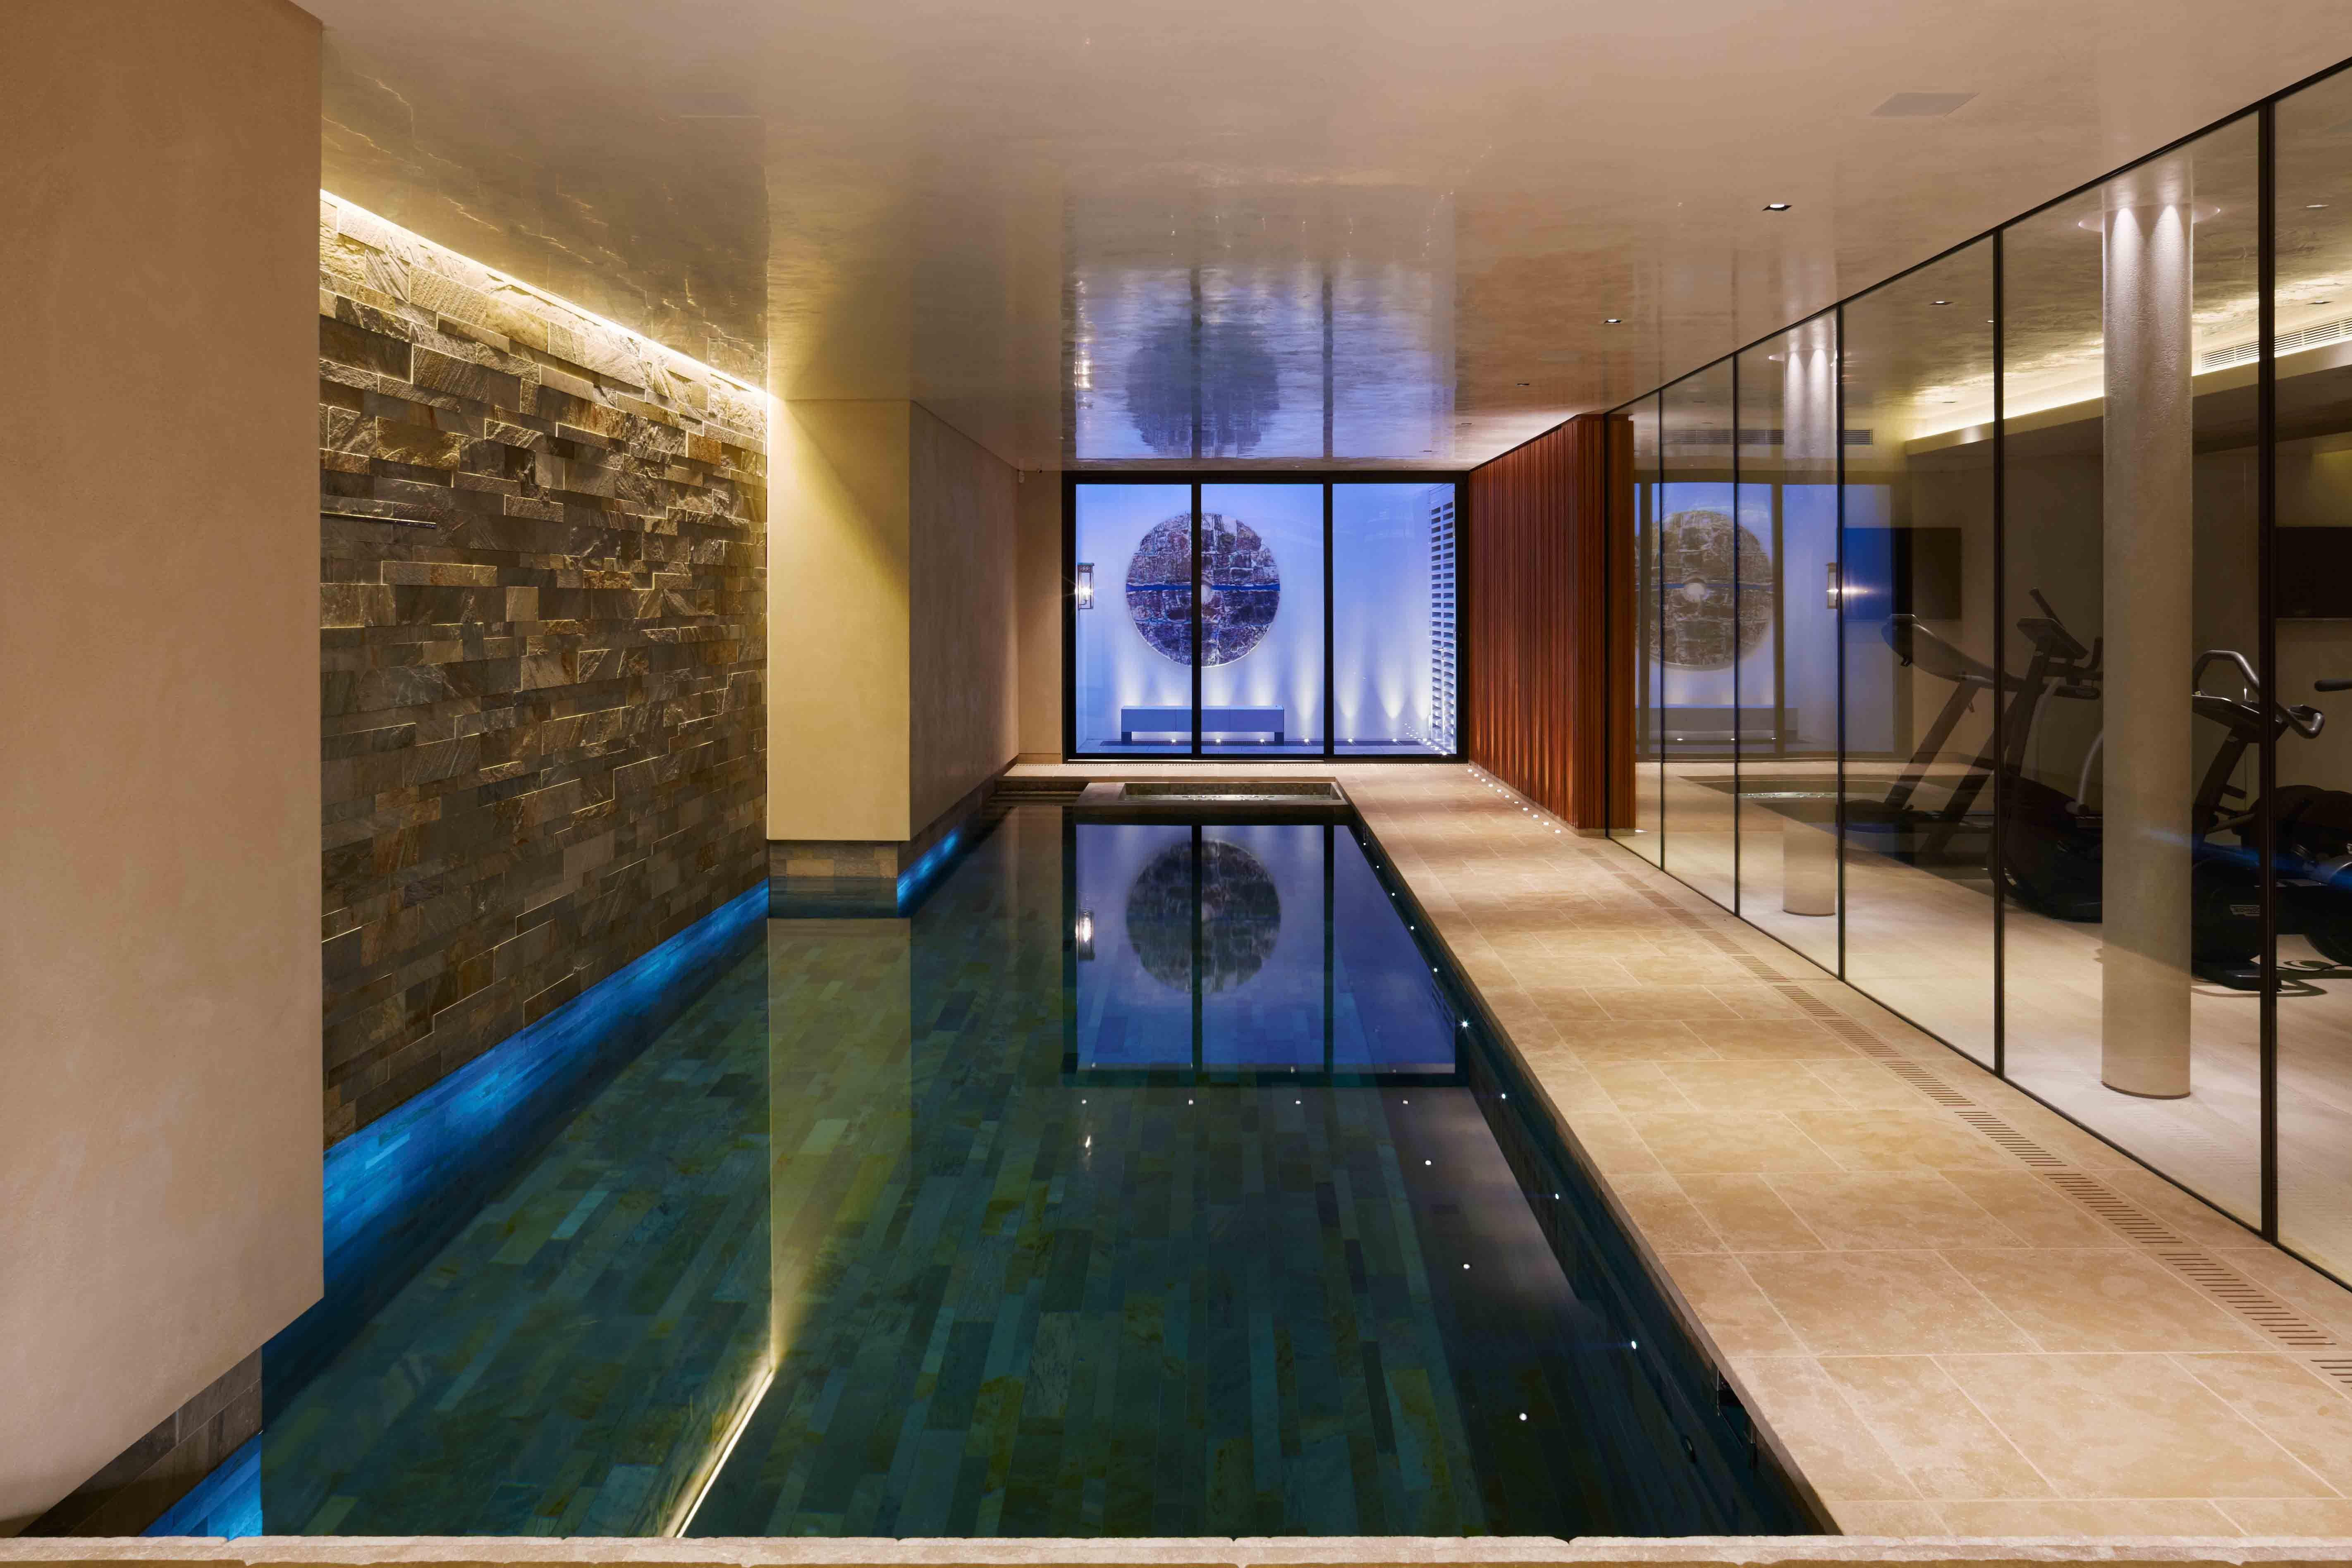 Best Kitchen Gallery: Swimming Pool Lighting Design By John Cullen Lighting Pool Spa of Pools Of Light Interior Design on rachelxblog.com